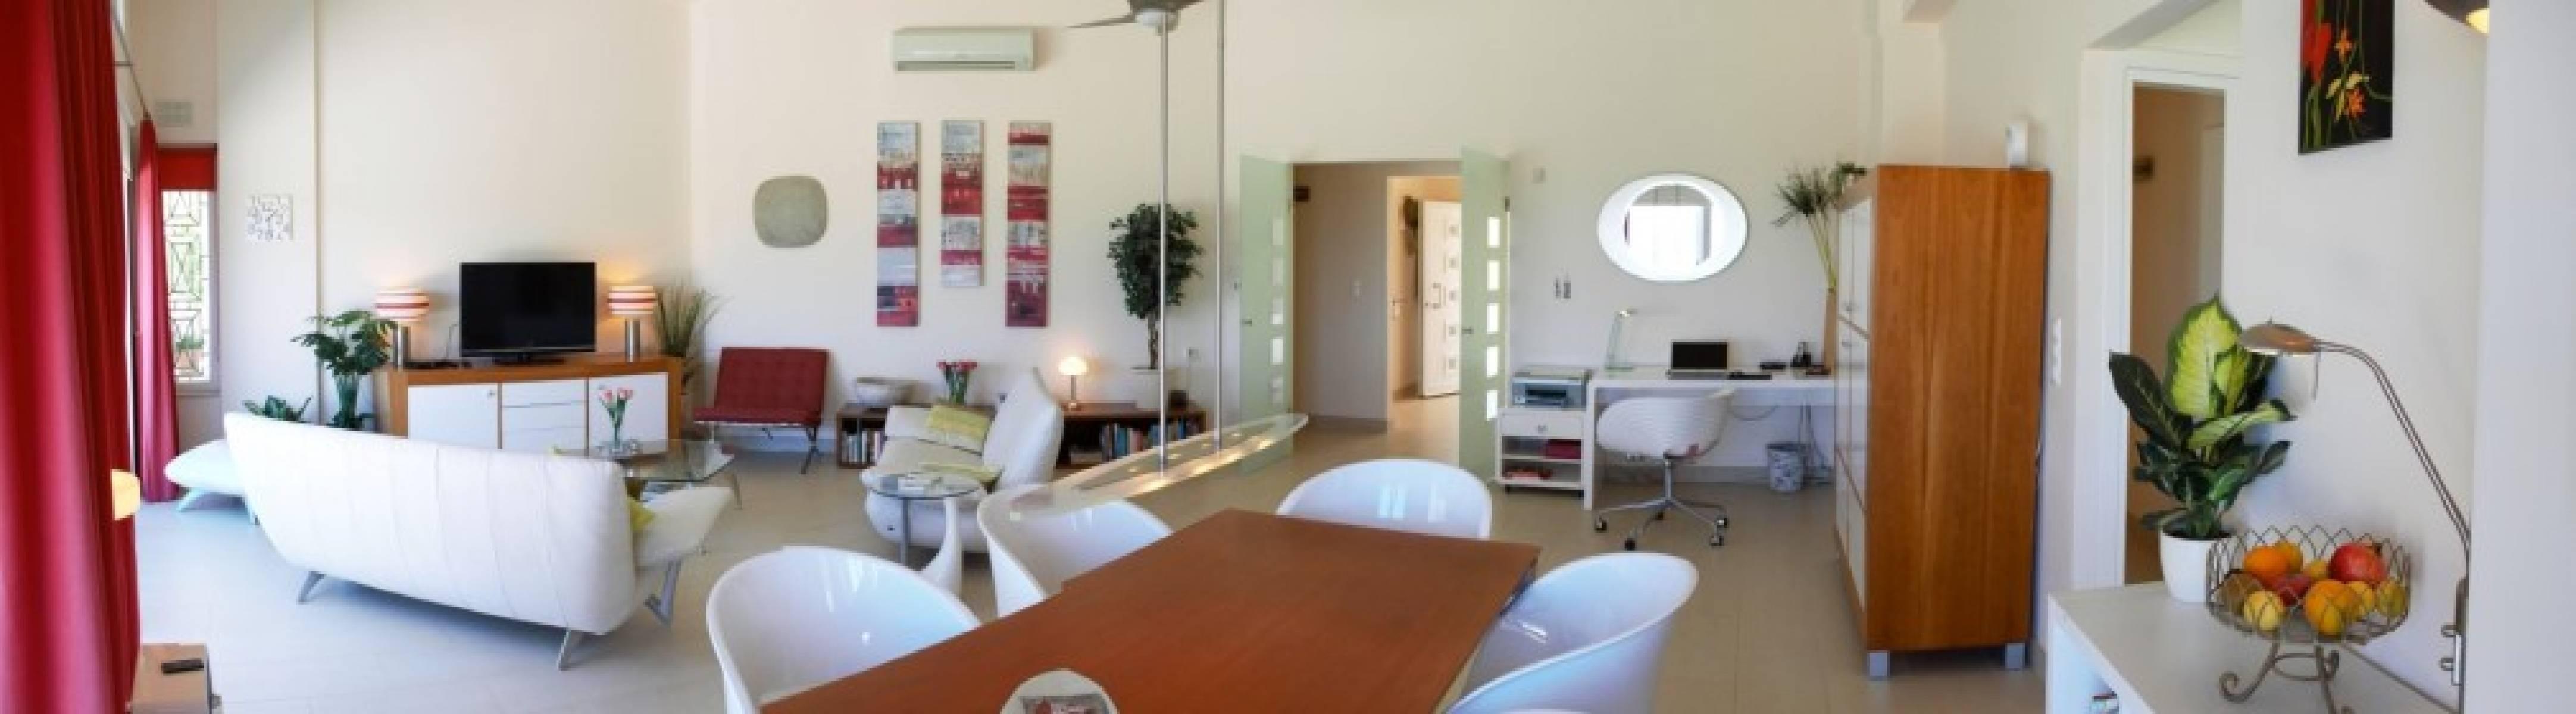 4 bedroom Villa in Platanes, Chania